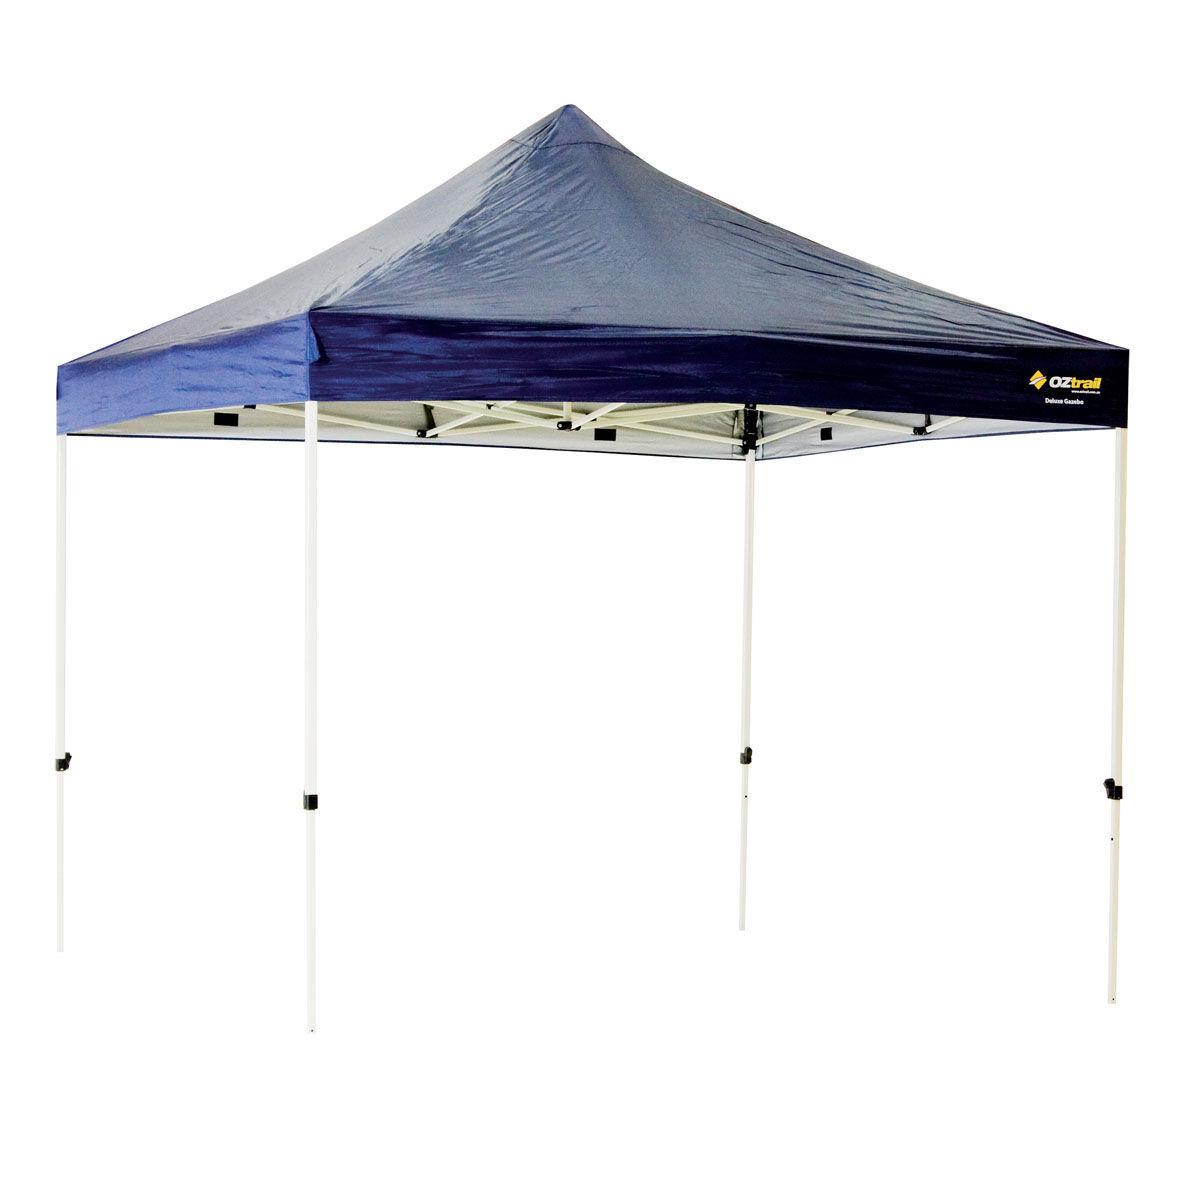 OzTrail Deluxe Gazebo 3x3m  bcf_hi-res ...  sc 1 st  BCF & Oztrail Gazebos Tents Swags u0026 Chairs   BCF